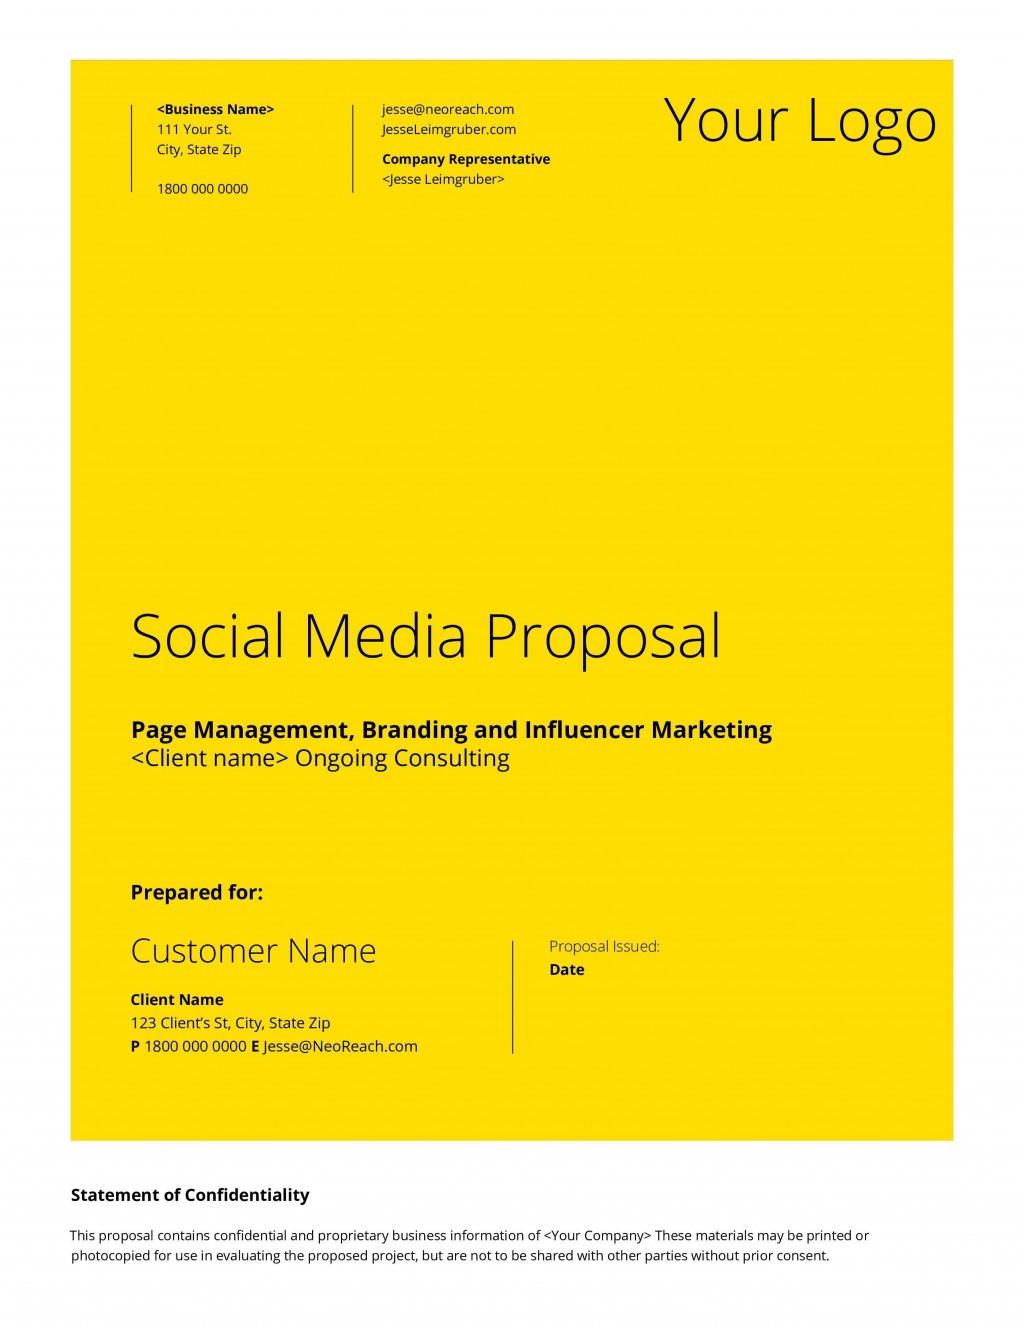 008 Frightening Social Media Proposal Template 2019 Inspiration Large